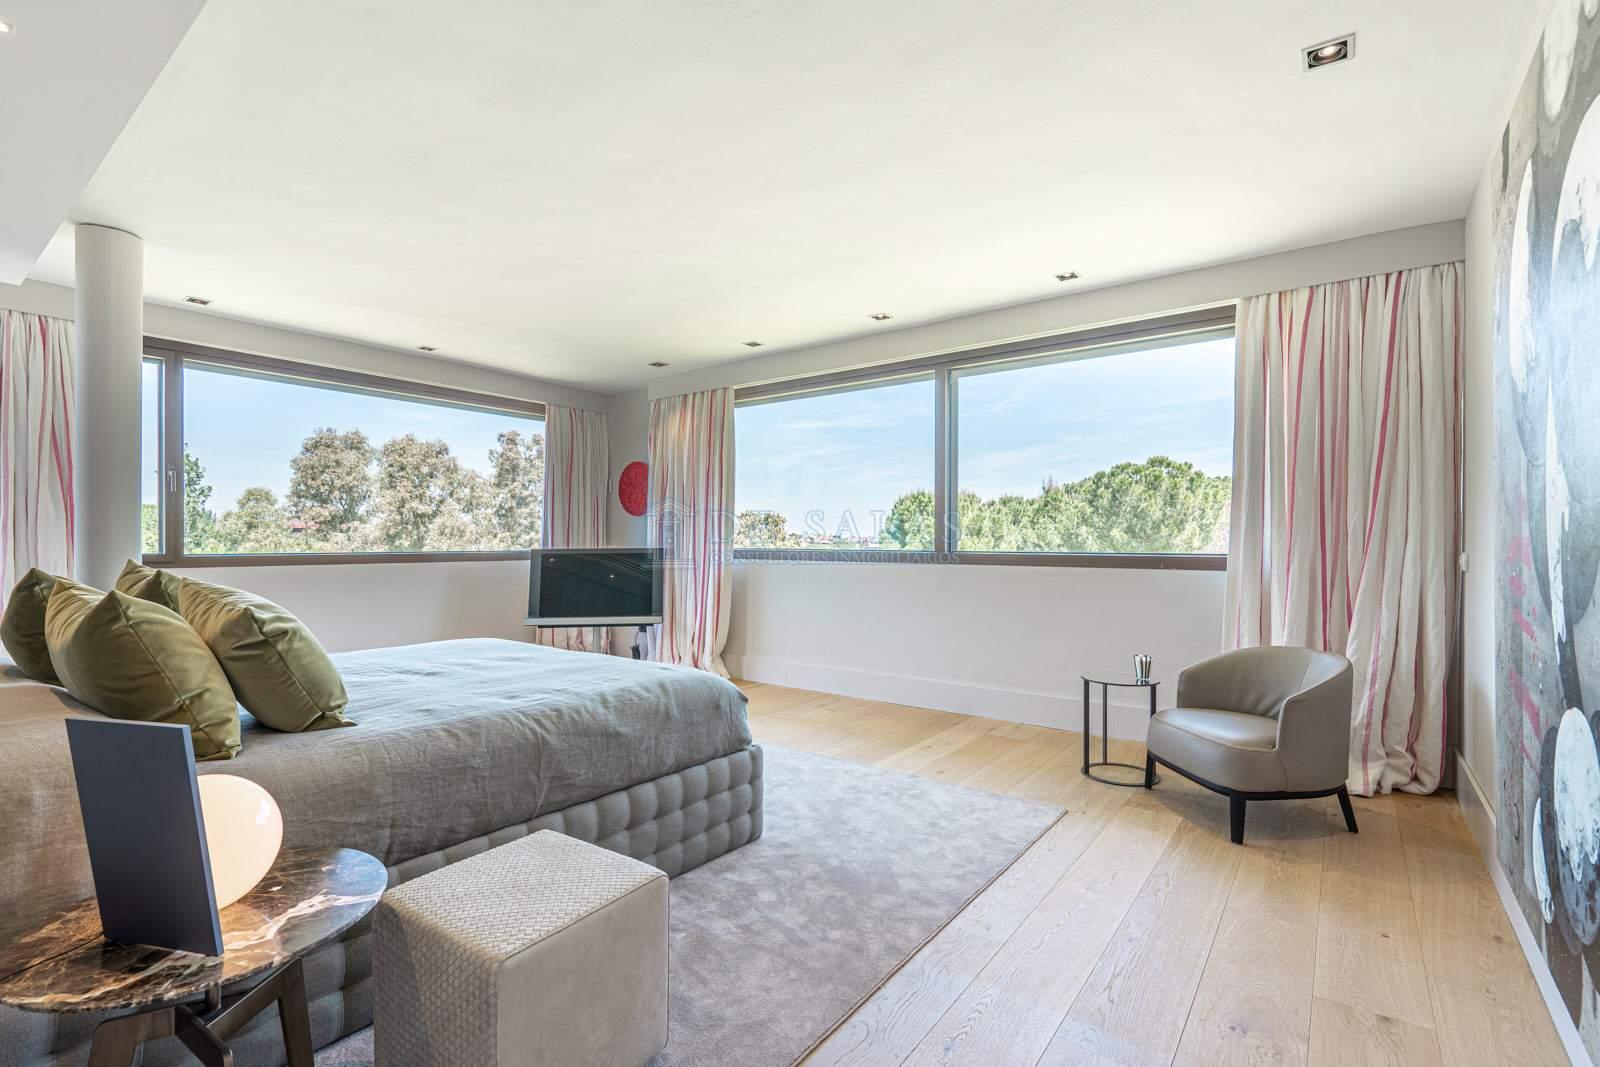 Dormitorio-0028